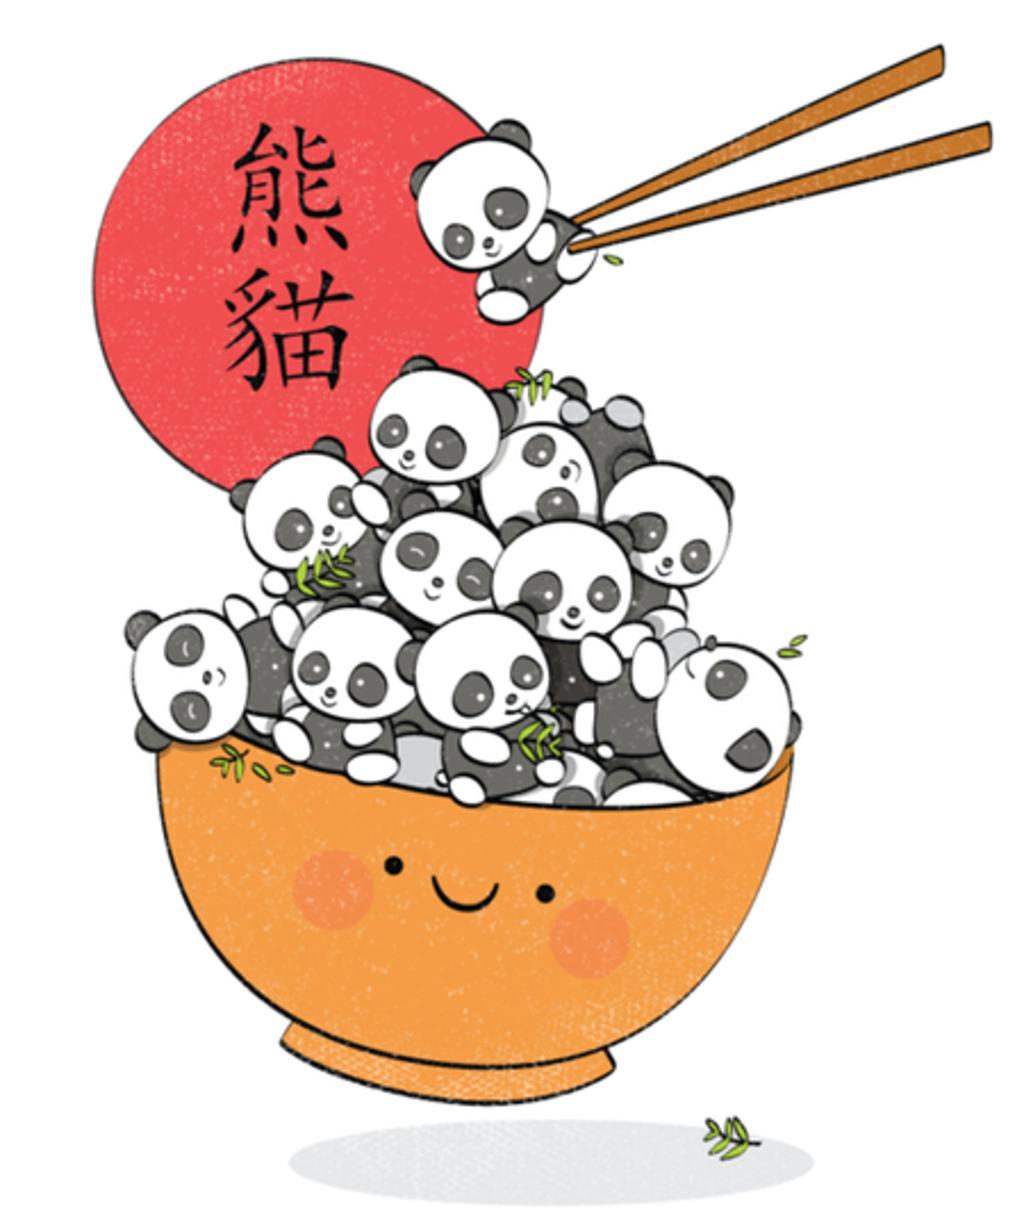 Qwertee: Save the pandas!